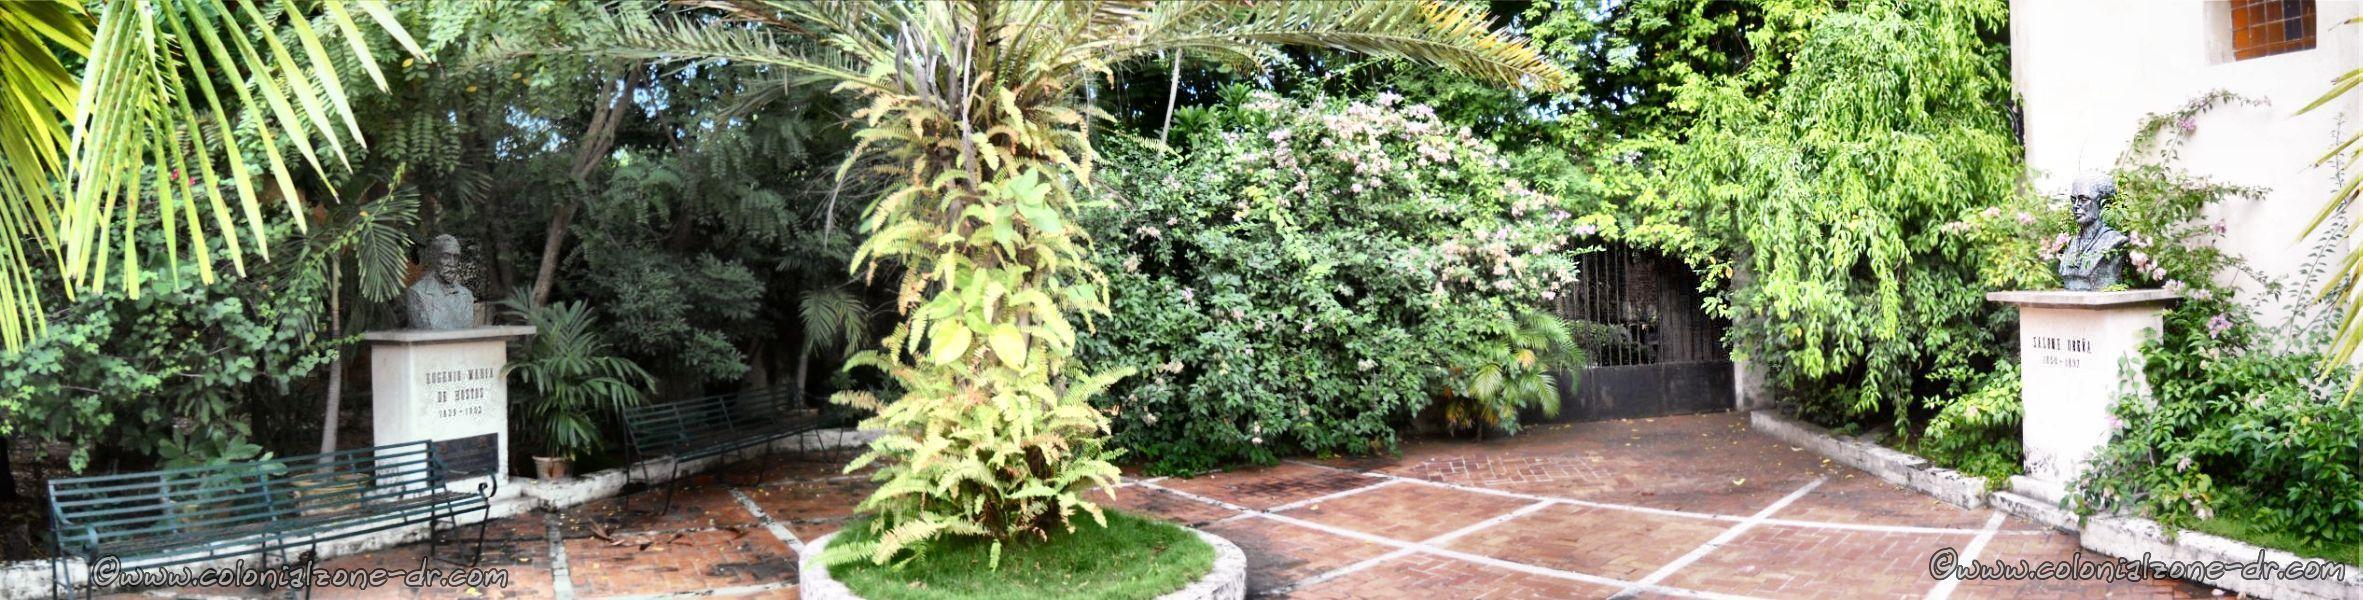 Plaza Capilla de la Tercera Orden Dominica Panorama